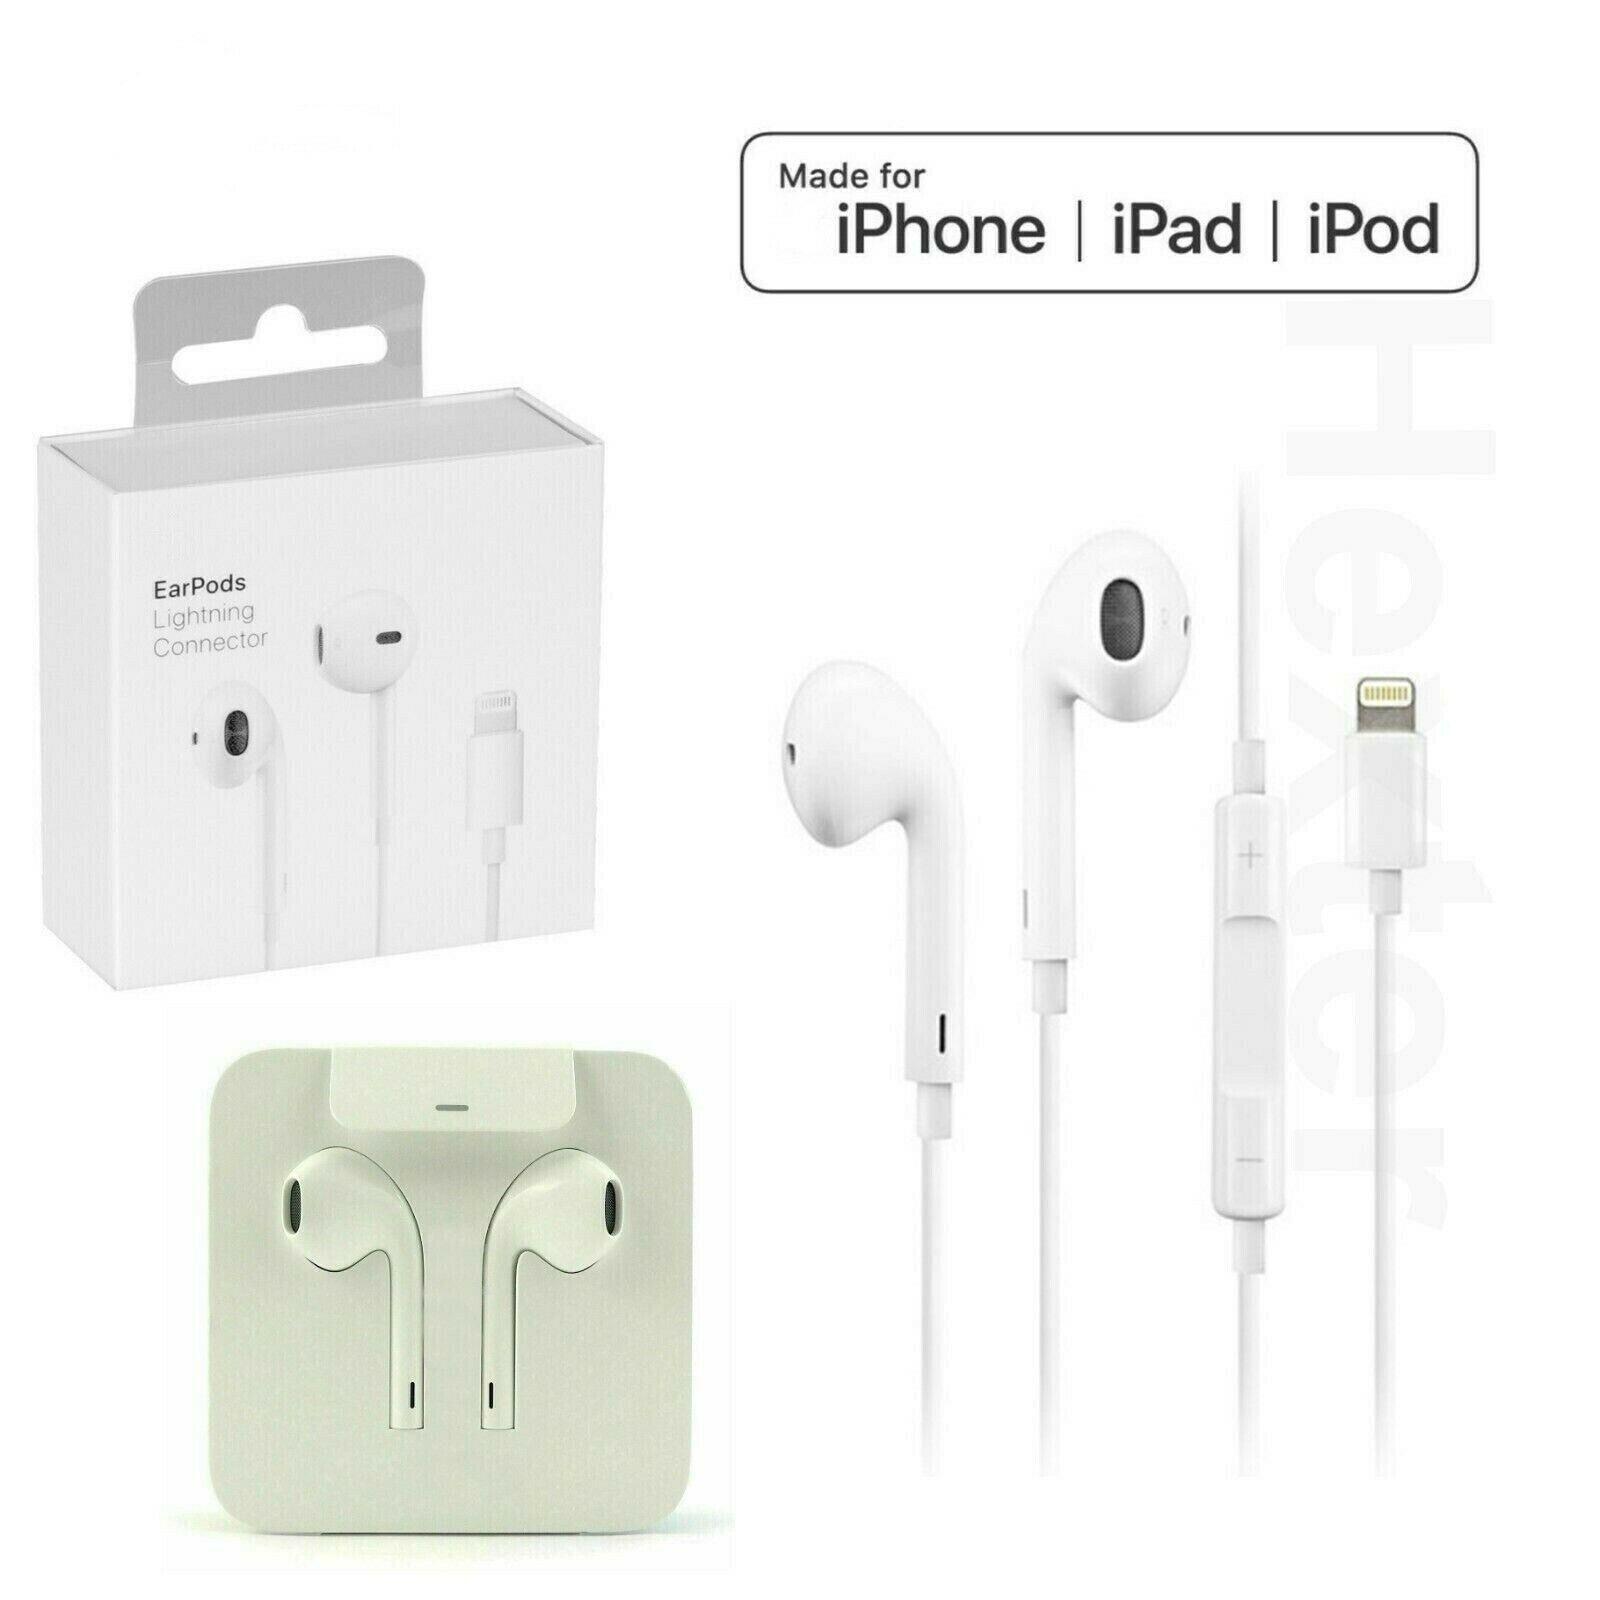 Genuine Apple Iphone 7 7 Plus Handsfree Earphones With Lightning Connector For Sale Ebay